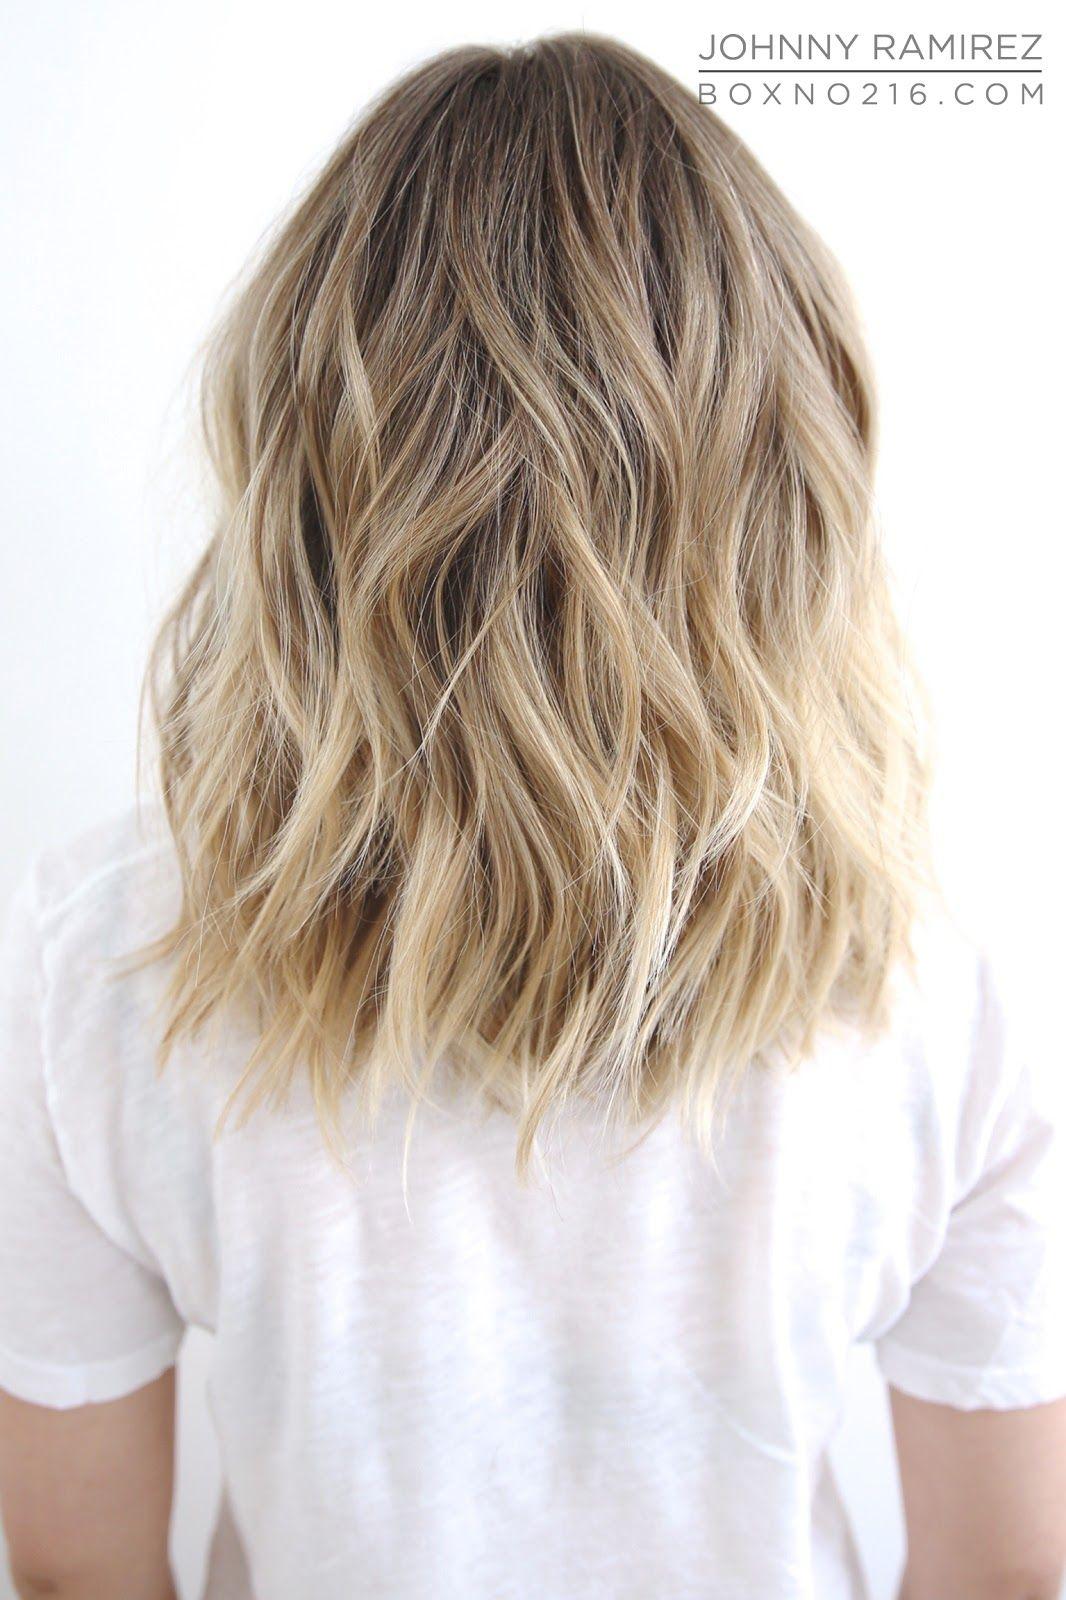 Summer color hair color by johnny ramirez u ig johnnyramirez